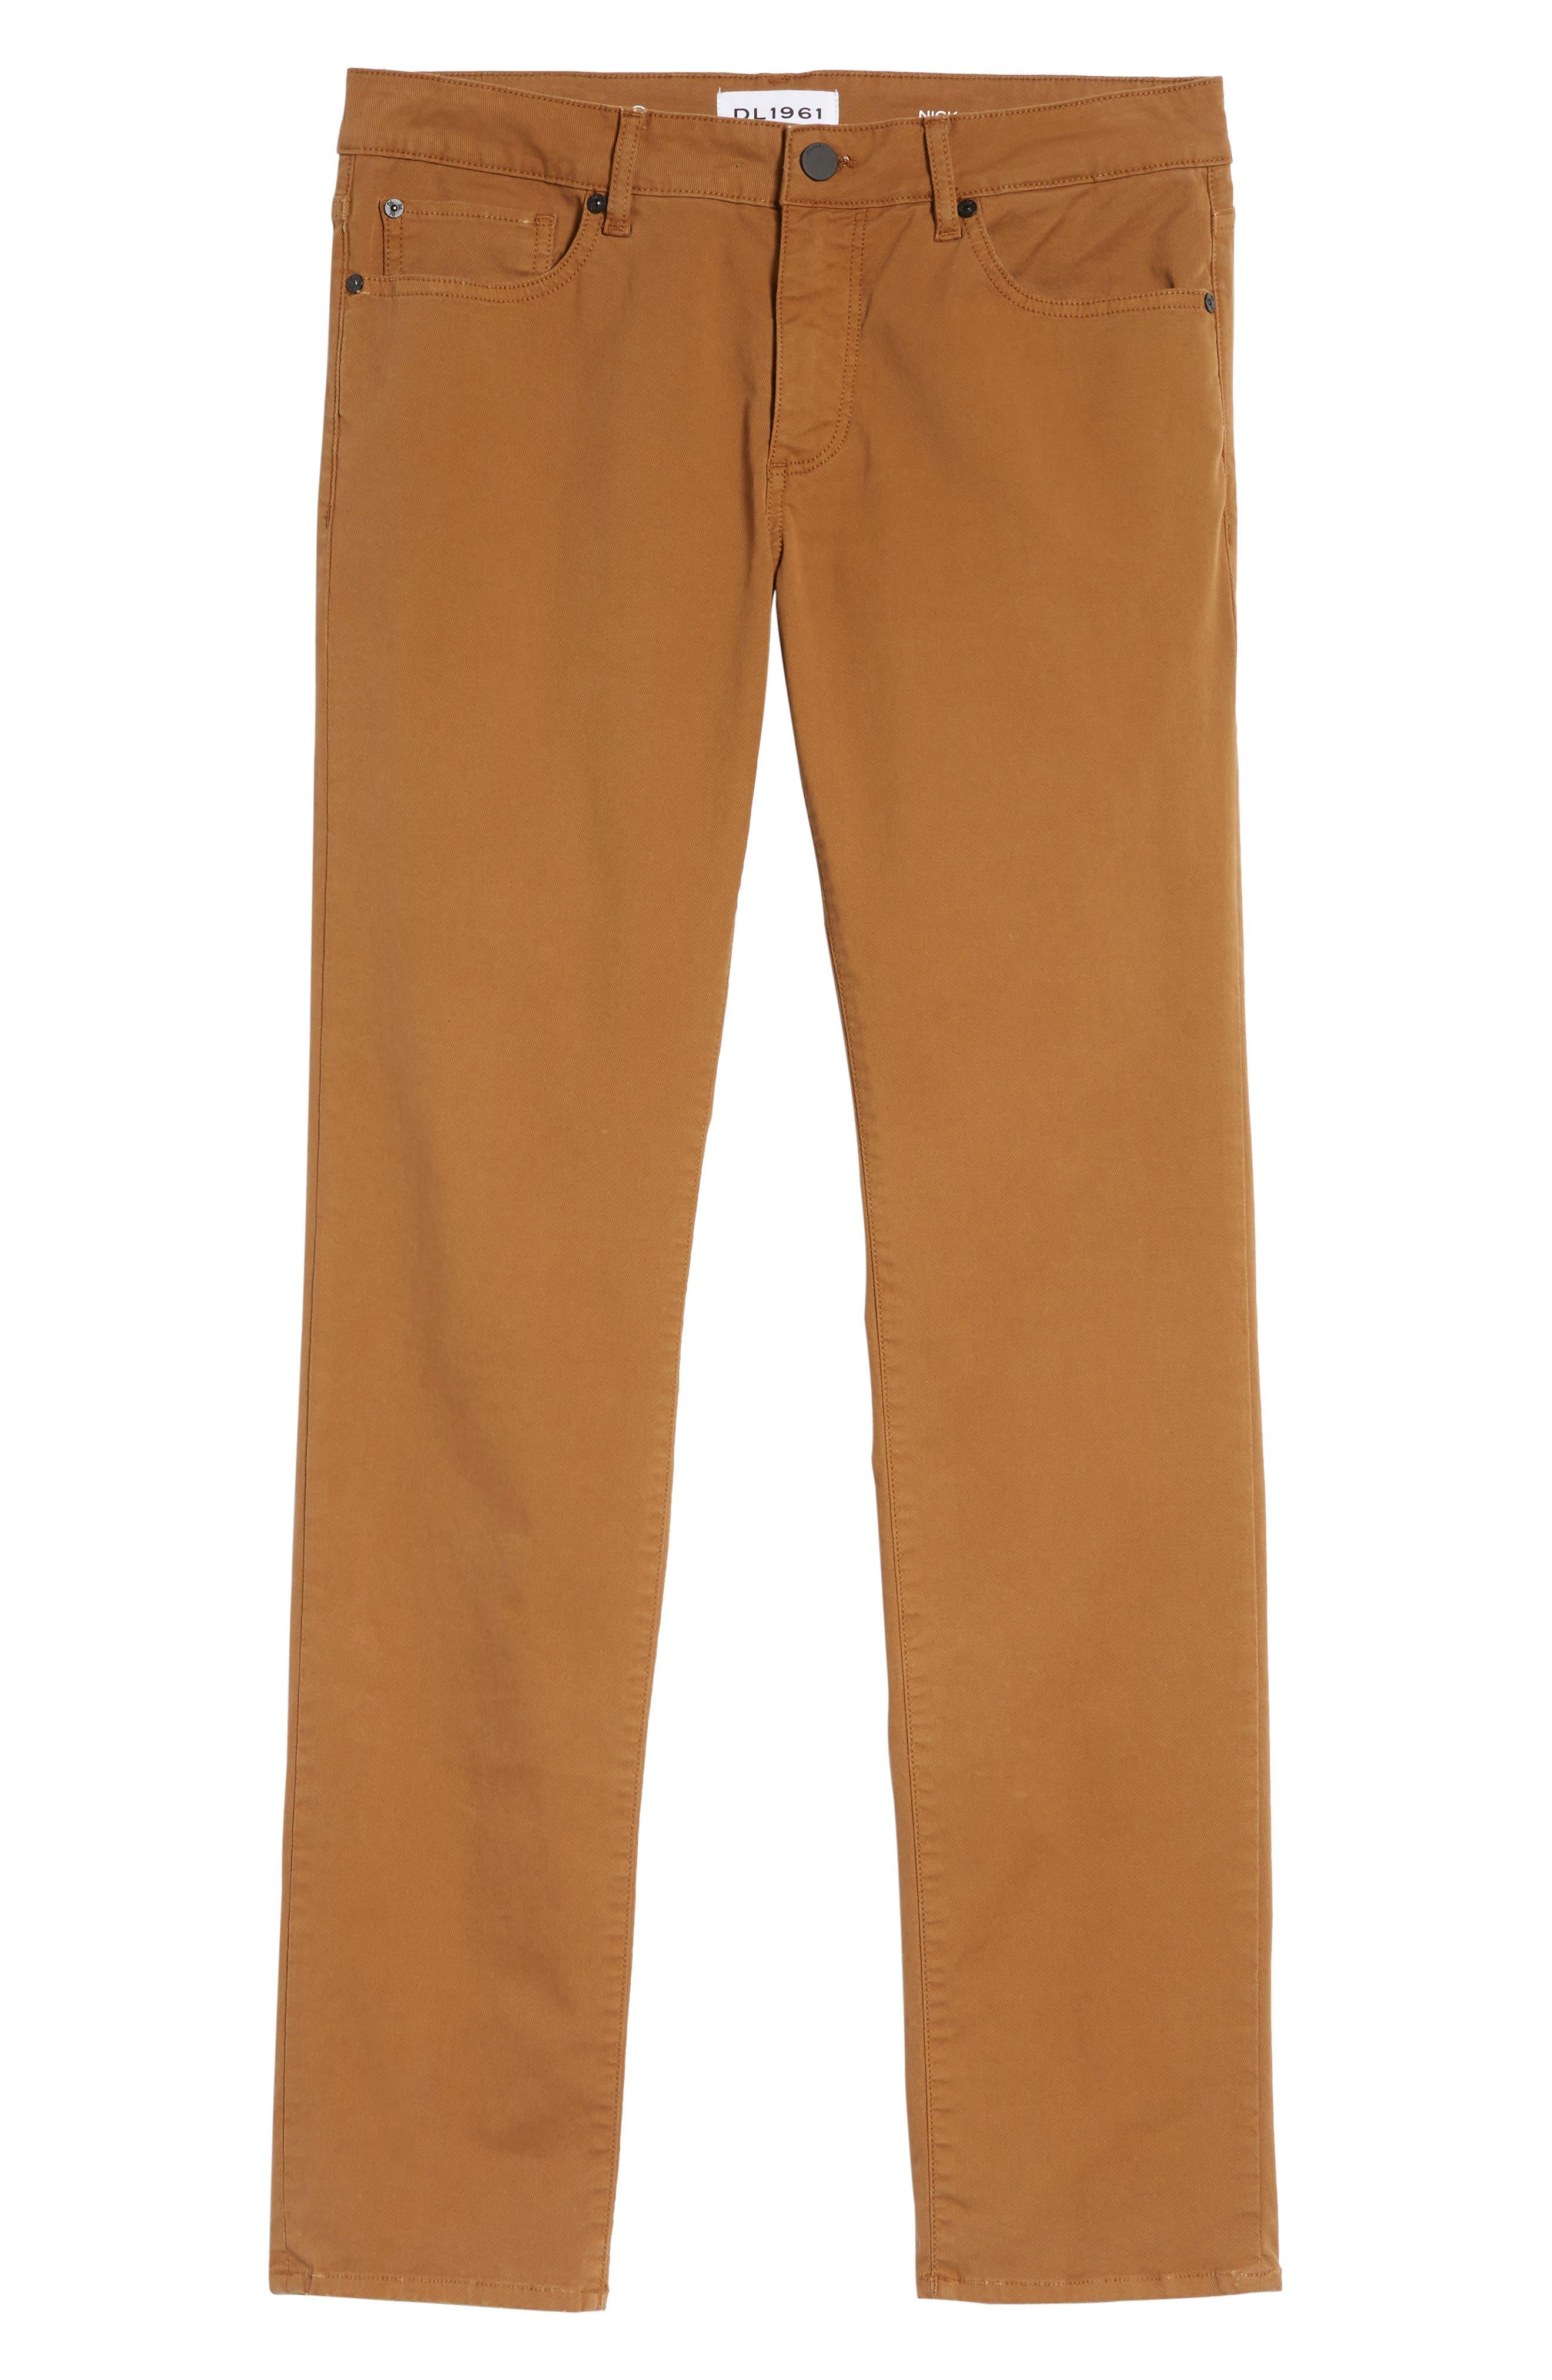 Nick Slim Fit Flat Front Pants,                             Alternate thumbnail 6, color,                             SIENNA